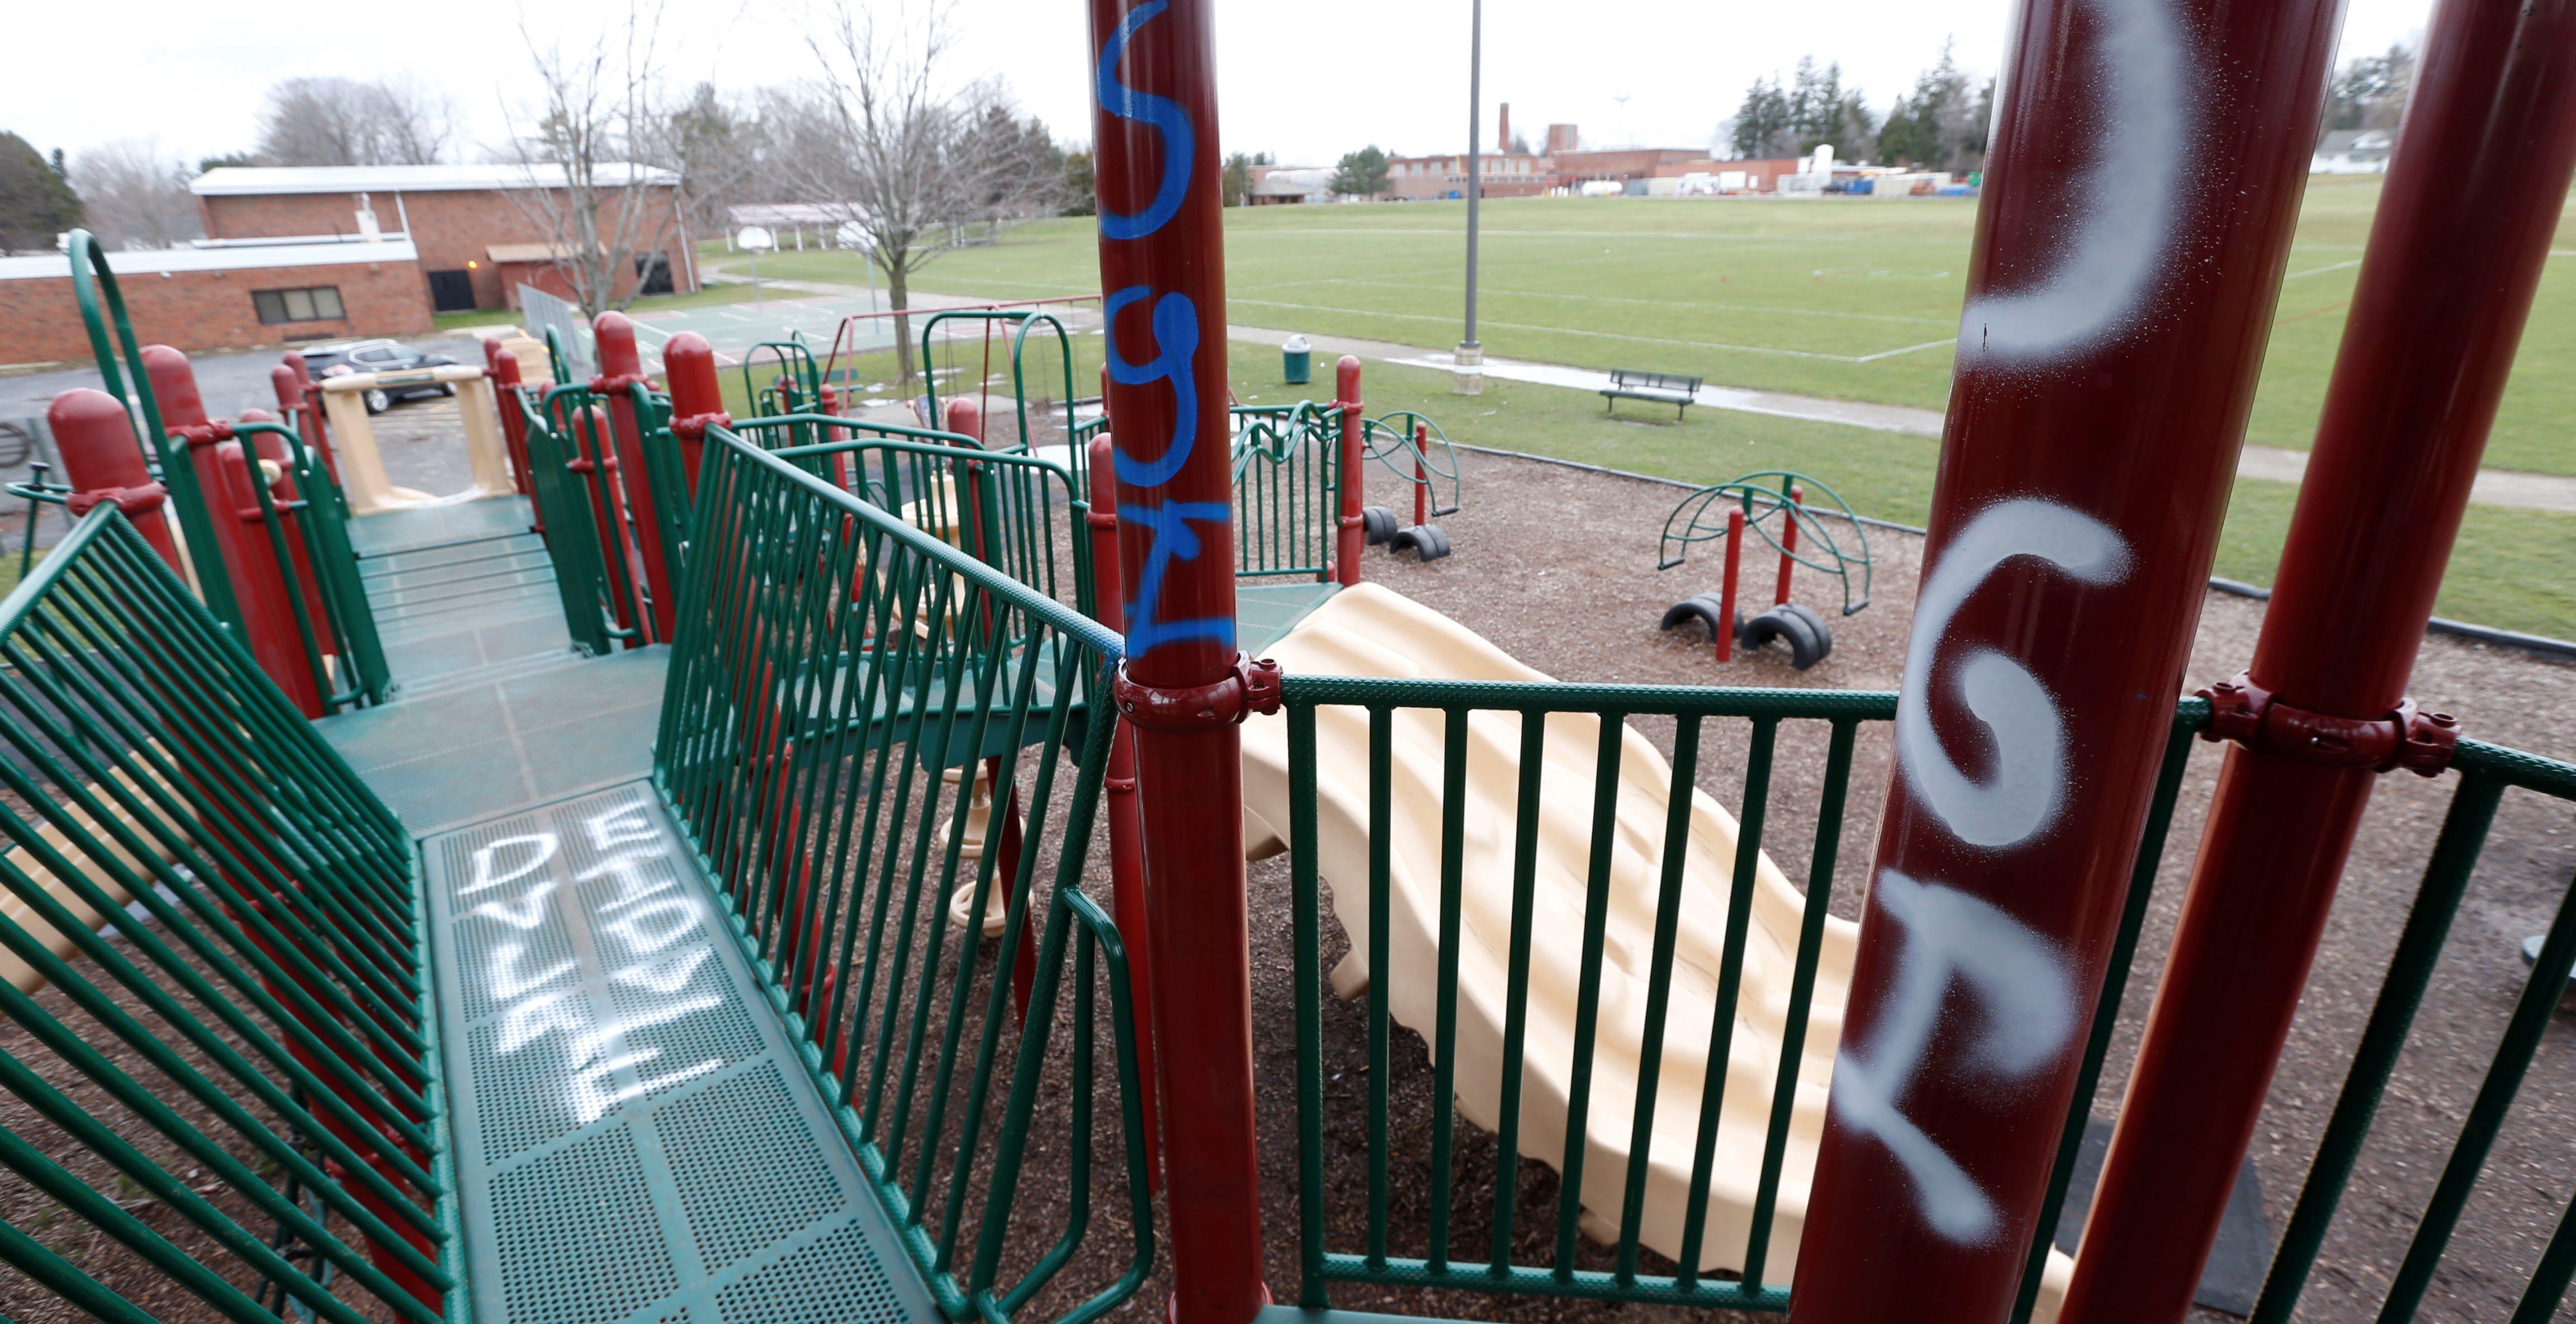 Vandalism is seen on the playground at South Davis Elementary School in Orchard Park.  (Robert Kirkham/Buffalo News)